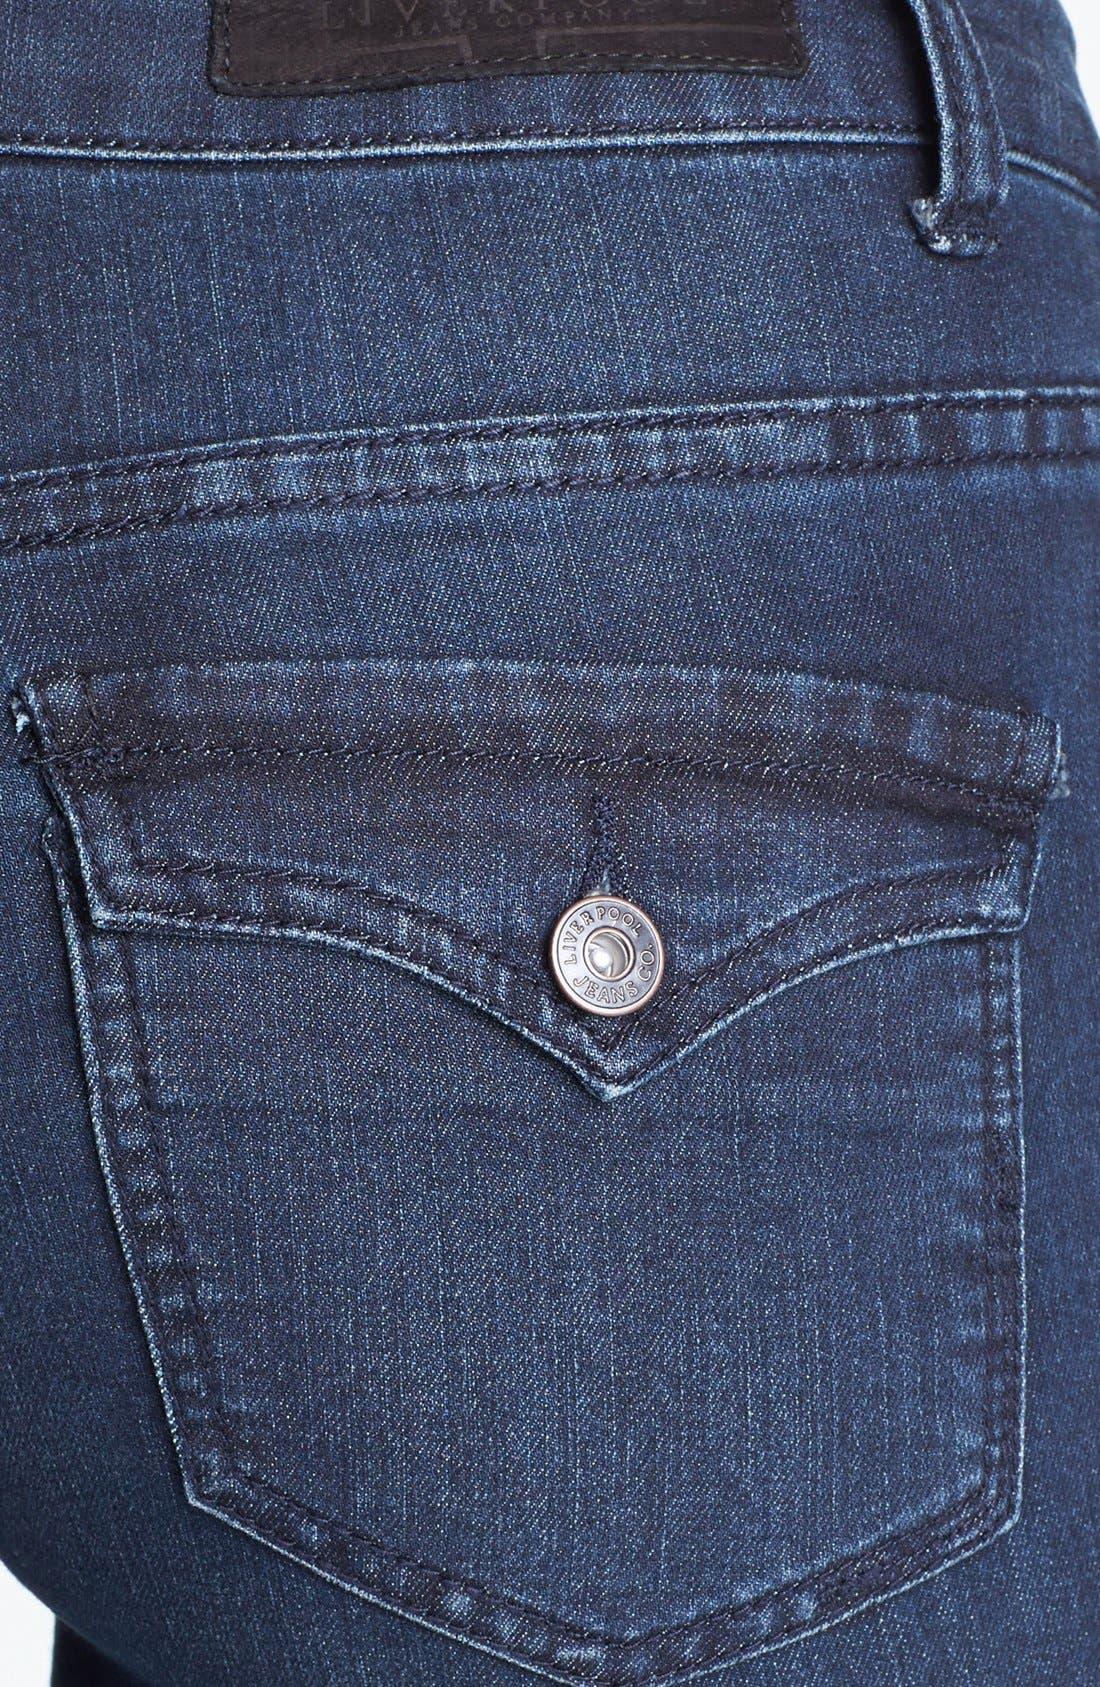 Alternate Image 3  - Liverpool Jeans Company 'Rita' Bootcut Stretch Jeans (Petite)